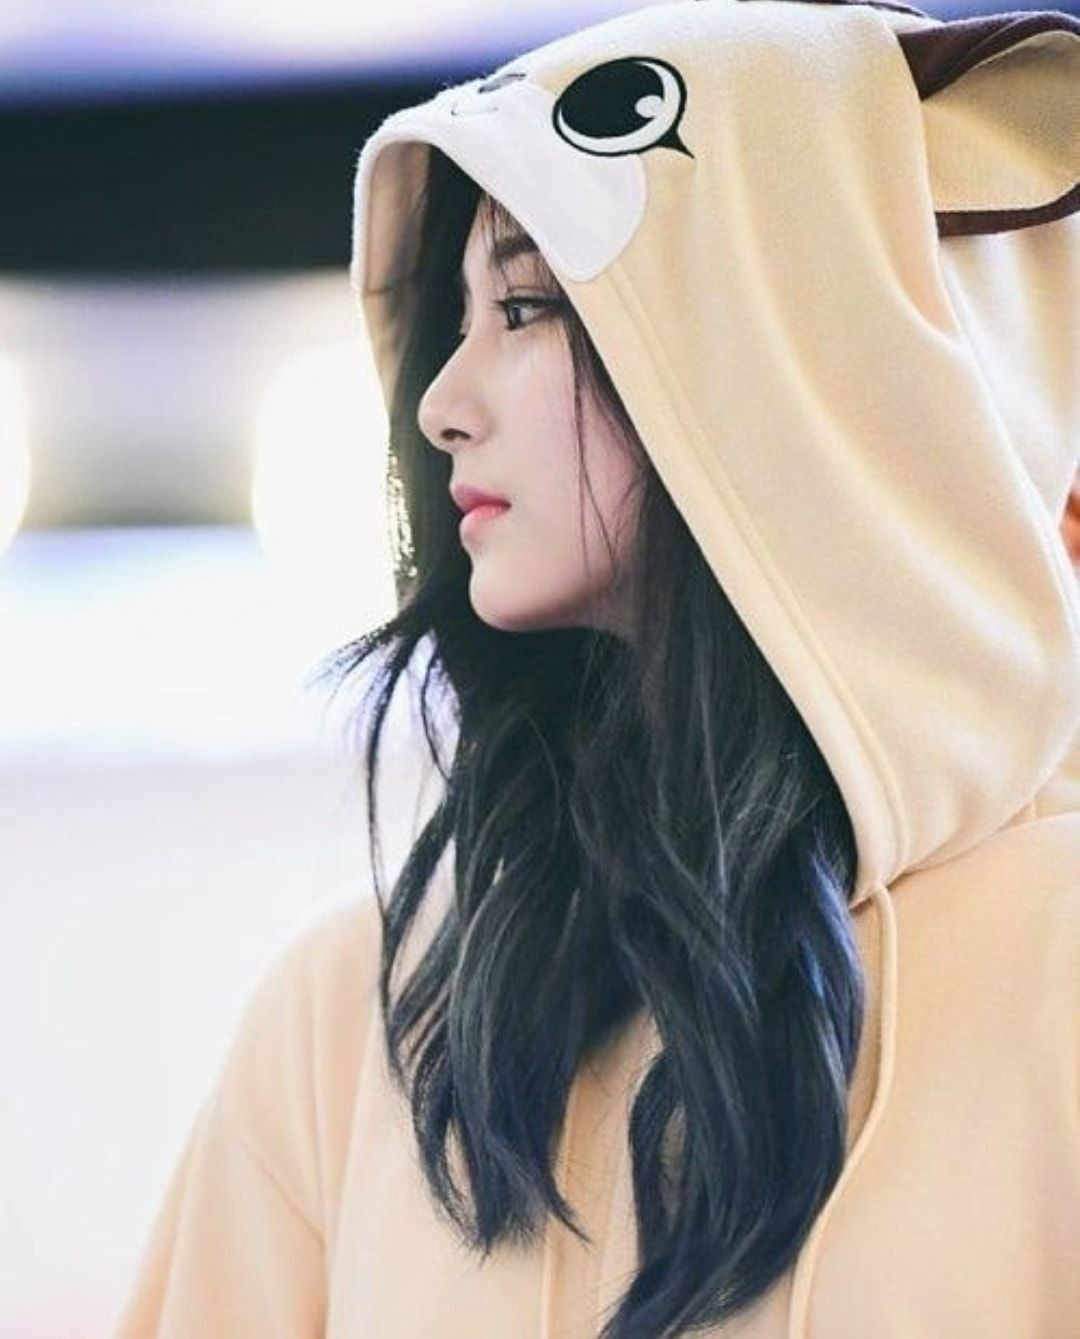 Stylish Girl Whatsapp Dp Profile Images Wallpaper Pics Free Download Kecantikan Orang Asia Gadis Korea Wanita